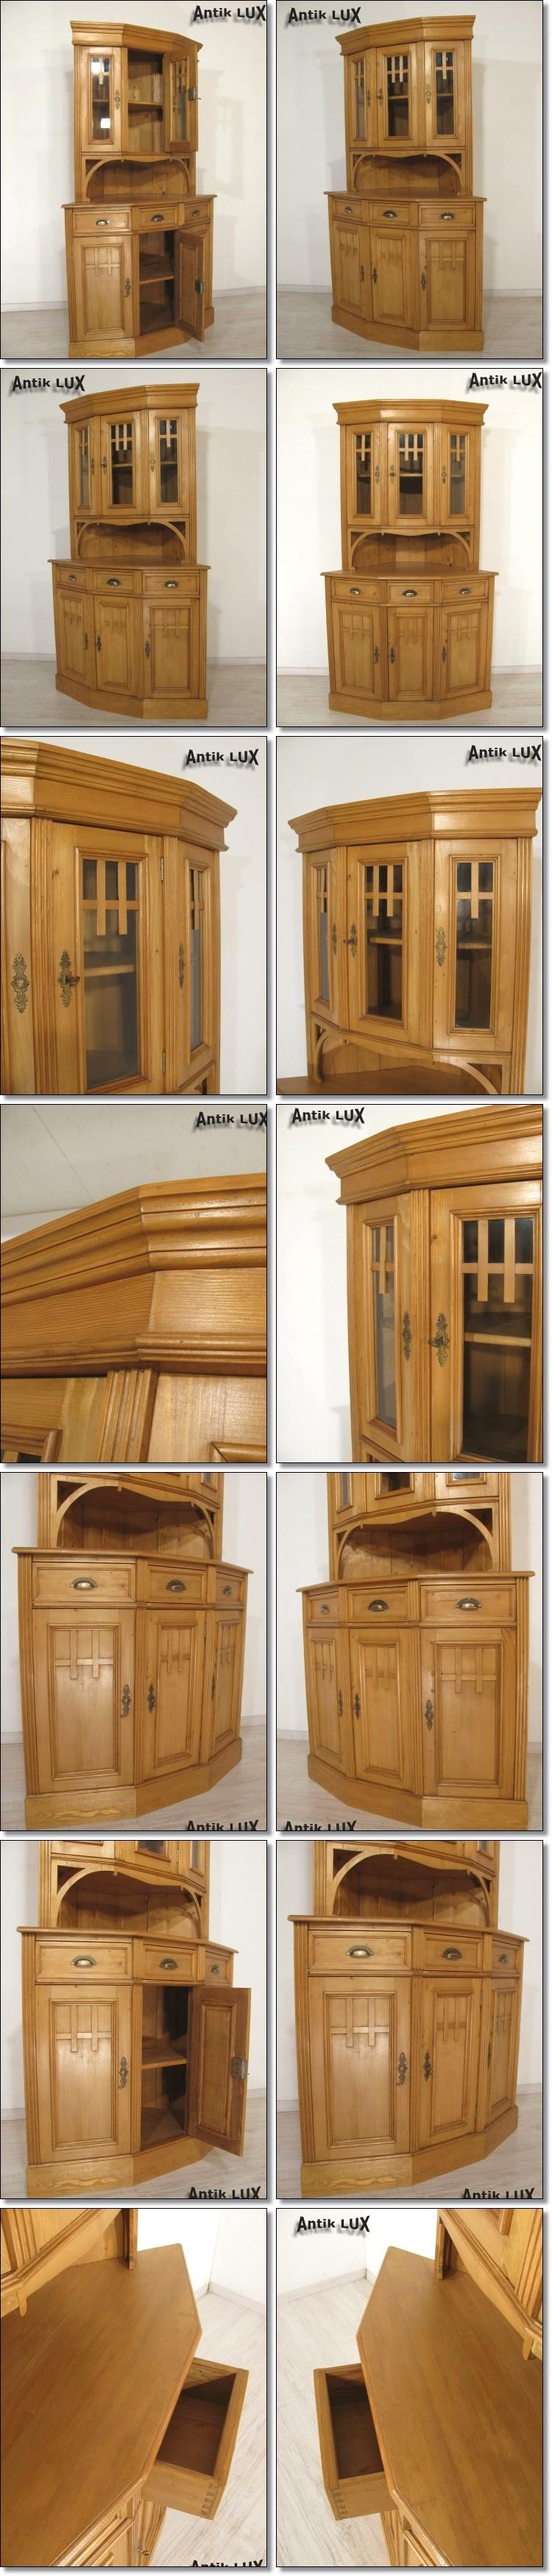 traumhafter jugendstil eckschrank in weichholz vitrine schrank regal antik lux ebay. Black Bedroom Furniture Sets. Home Design Ideas